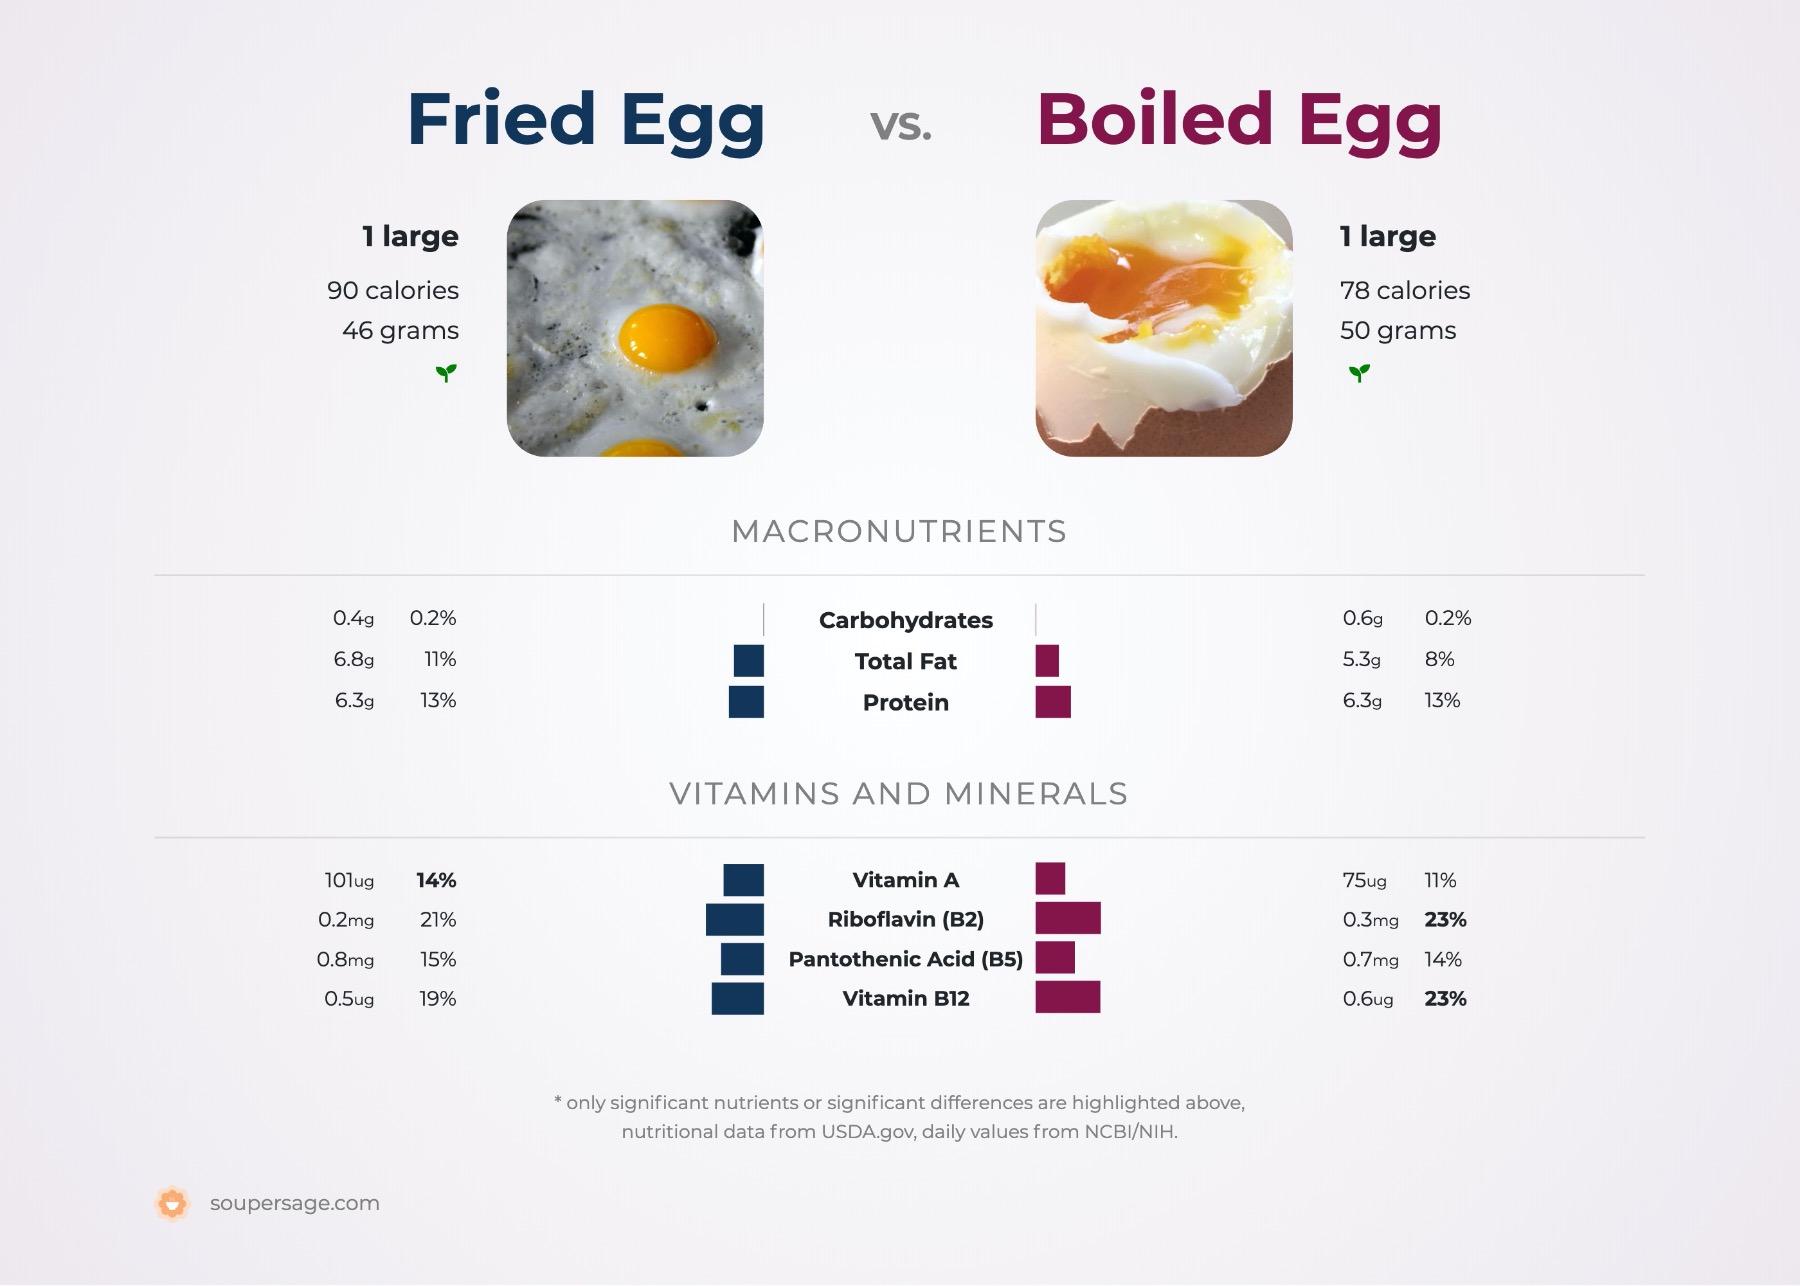 nutrition comparison of boiled egg vs. fried egg